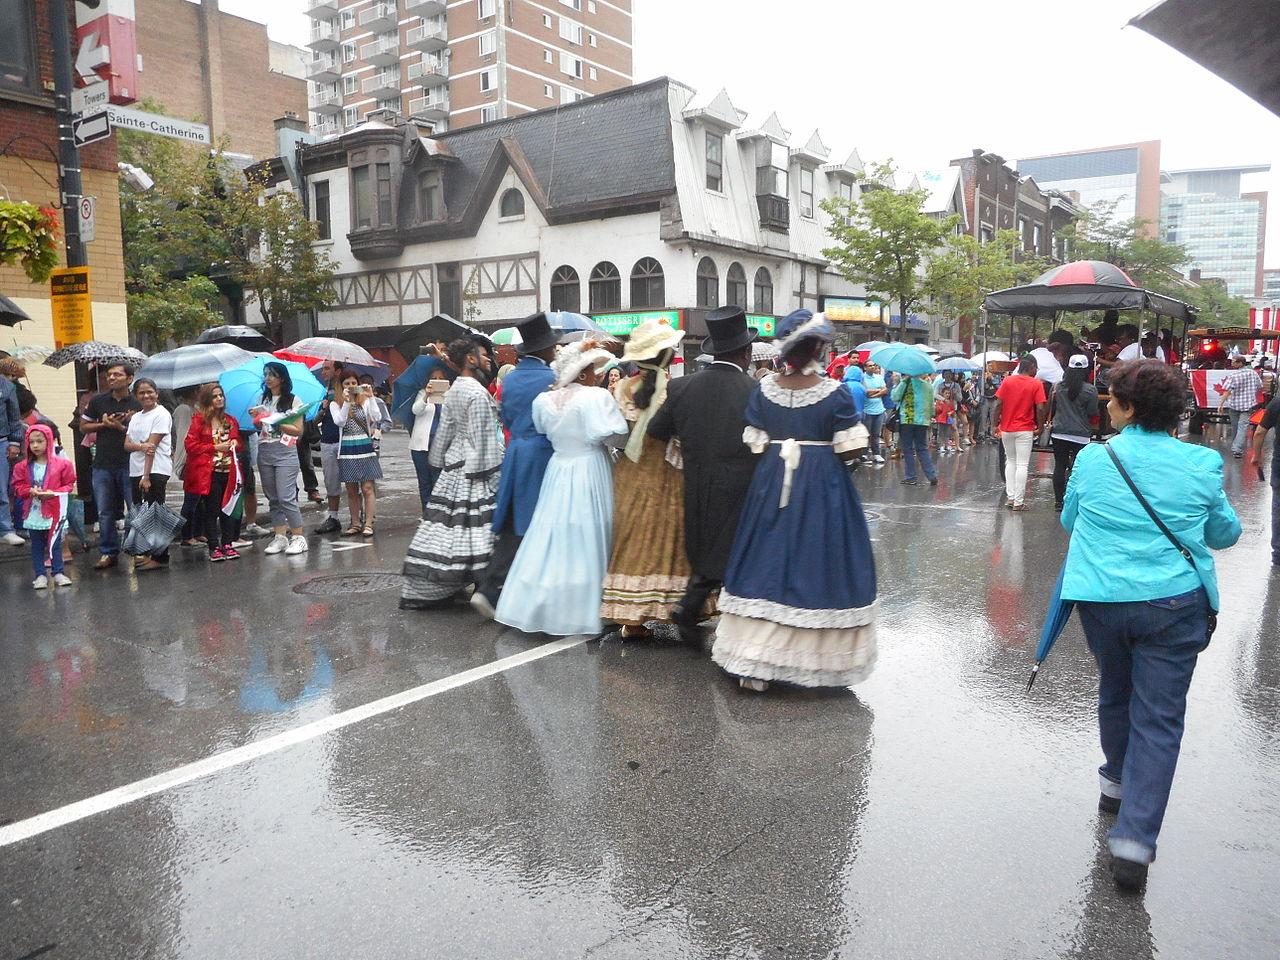 File:Canada Day 2015 on Saint Catherine Street - 202.jpg - Wikimedia